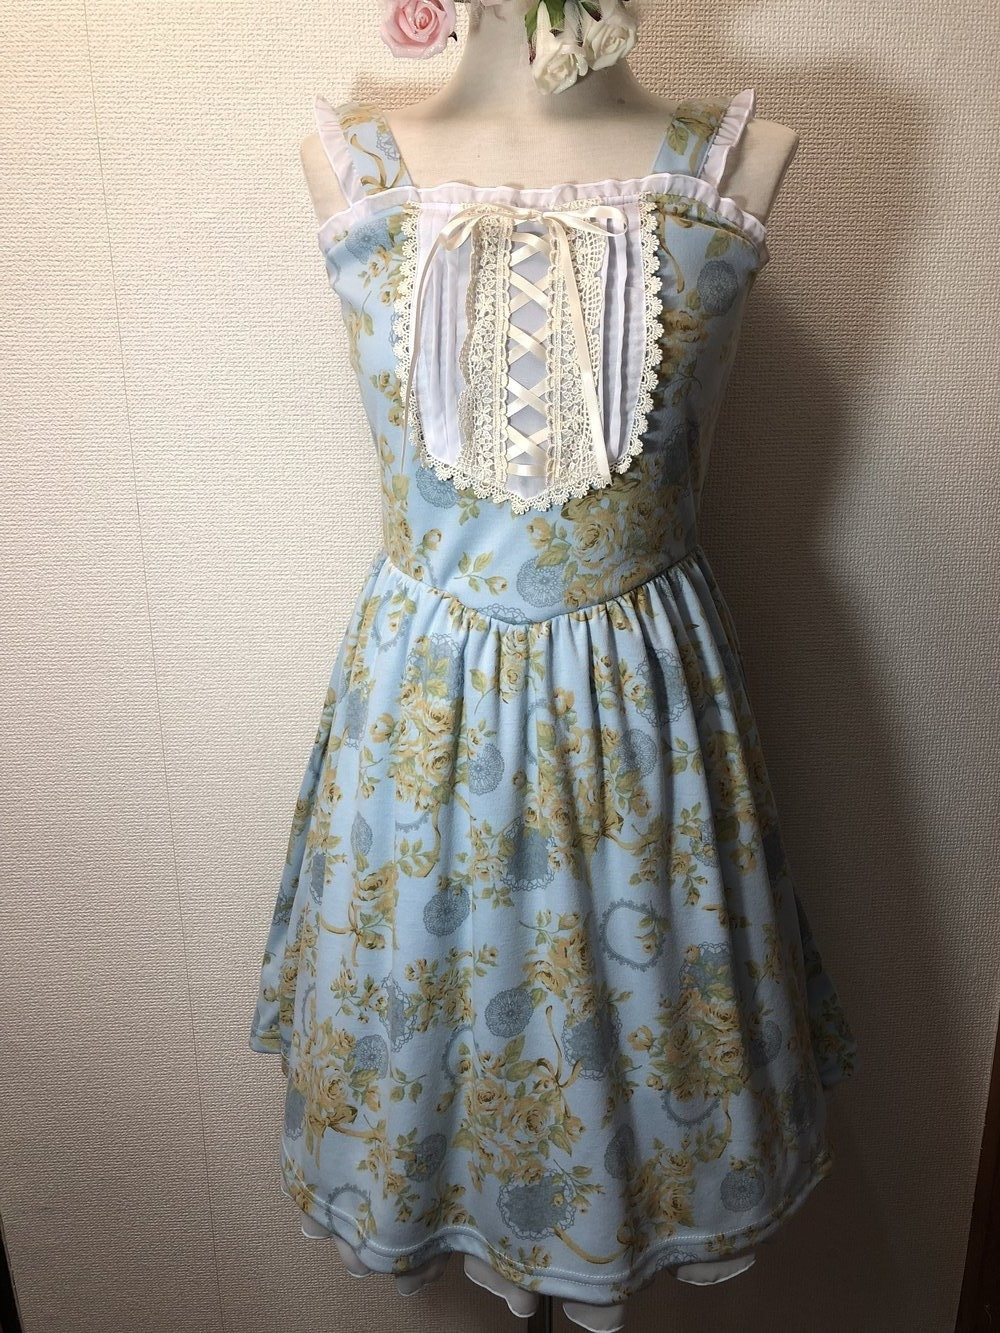 15 Genial Kleid Hellblau Spitze Spezialgebiet  Abendkleid